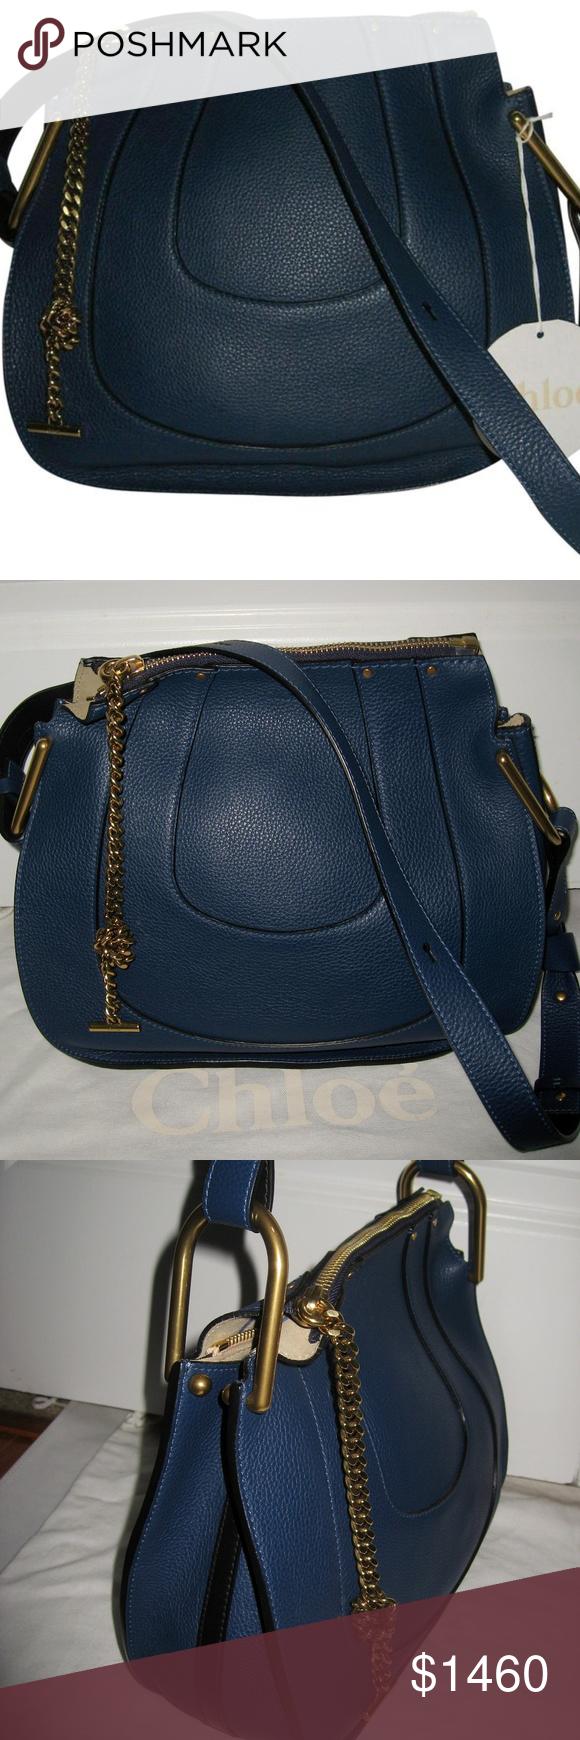 111fa4e615 Chloé Royal Navy Leather Hayley Shoulder Bag Authentic NWT Chloe Hayley  Medium shoulder bag in leather